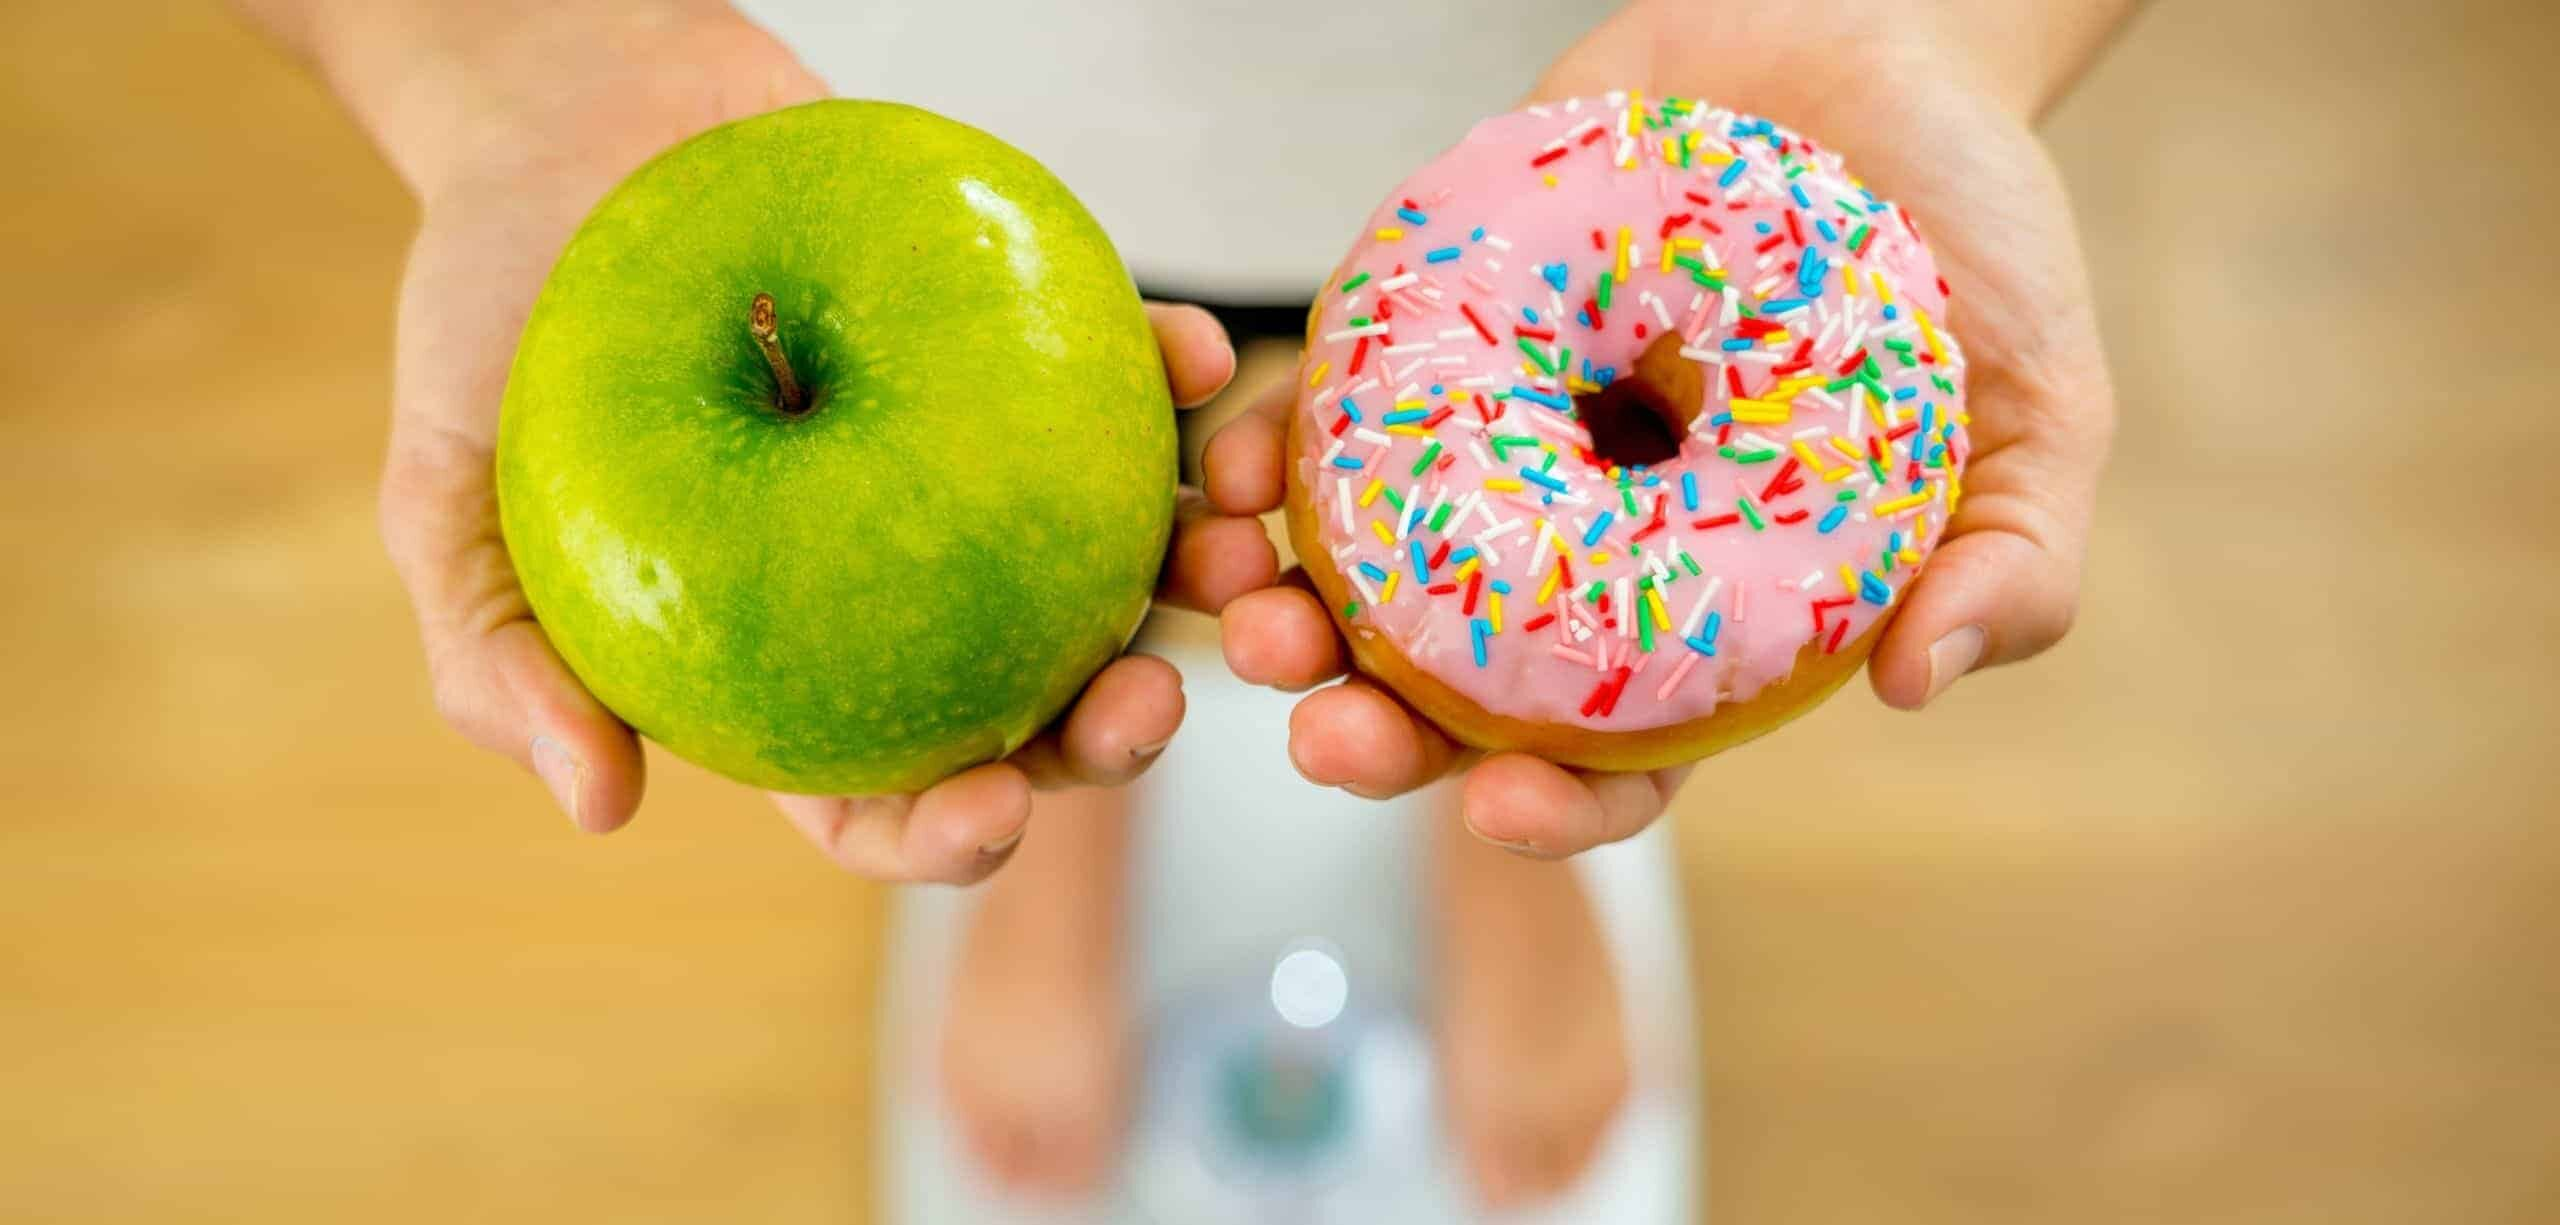 Dieta detox depurativa